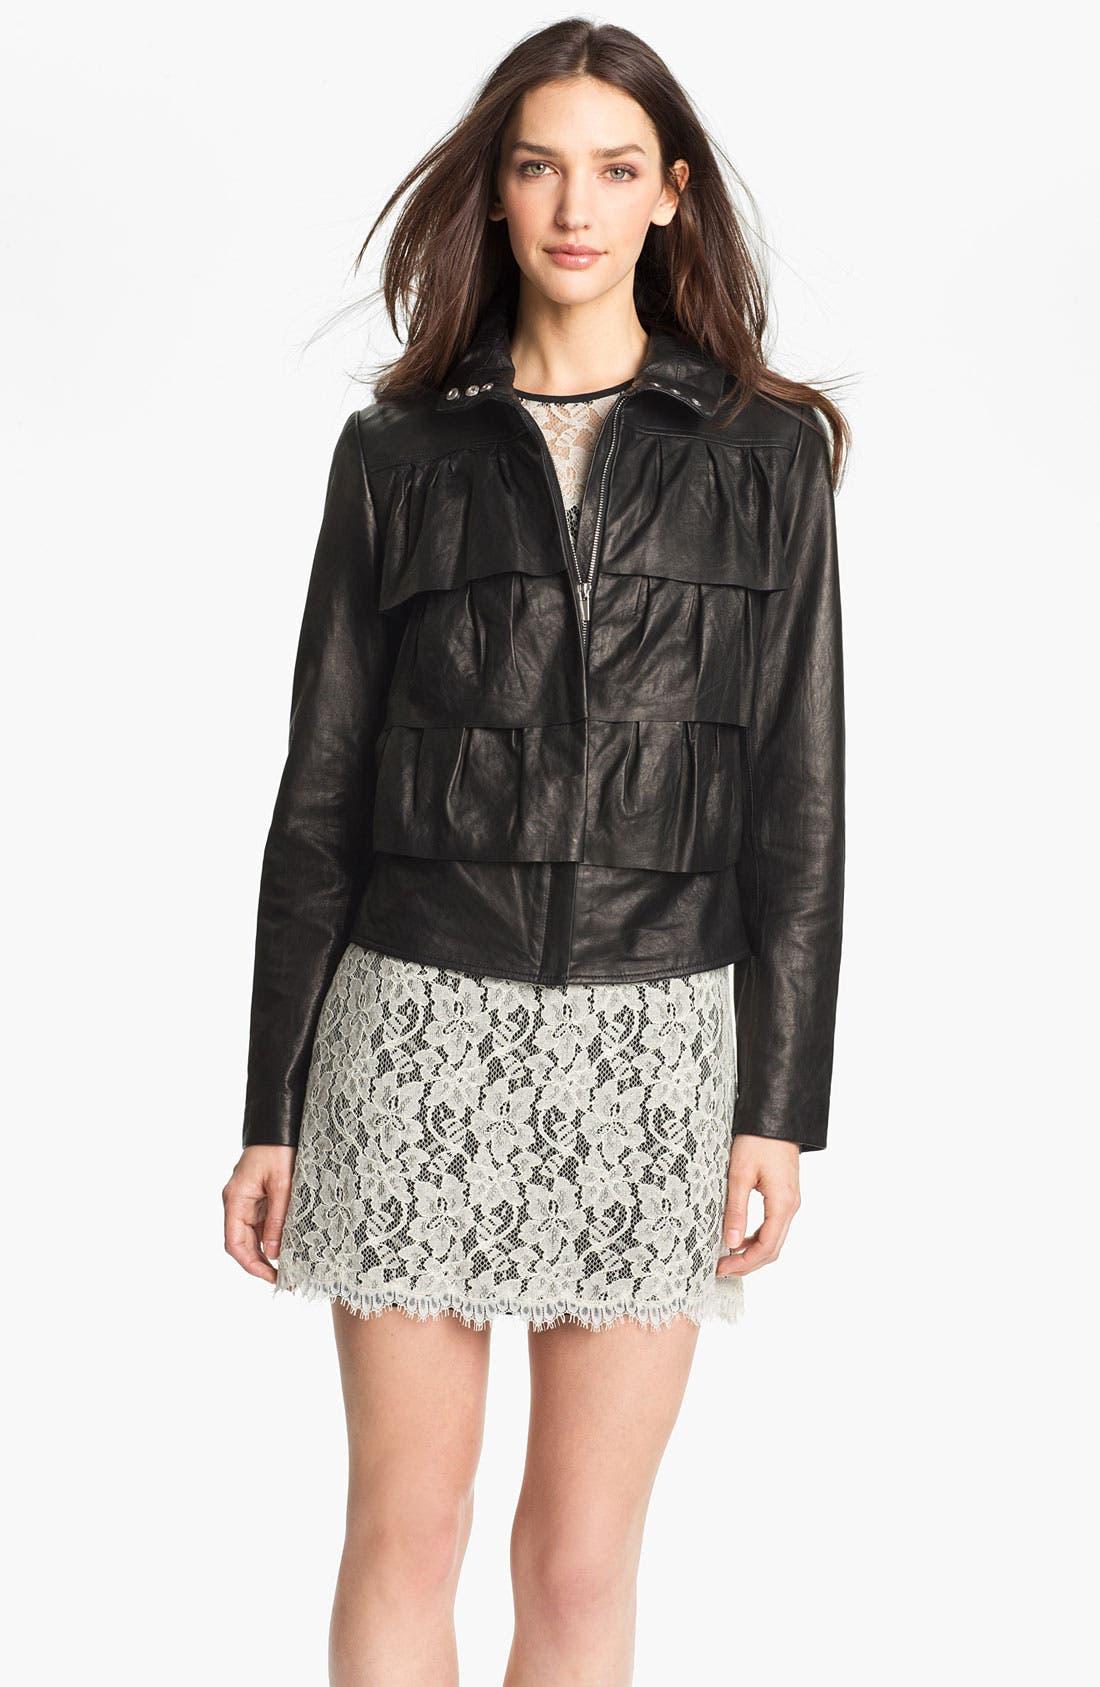 Alternate Image 1 Selected - Diane von Furstenberg 'Cupcake' Leather Bomber Jacket